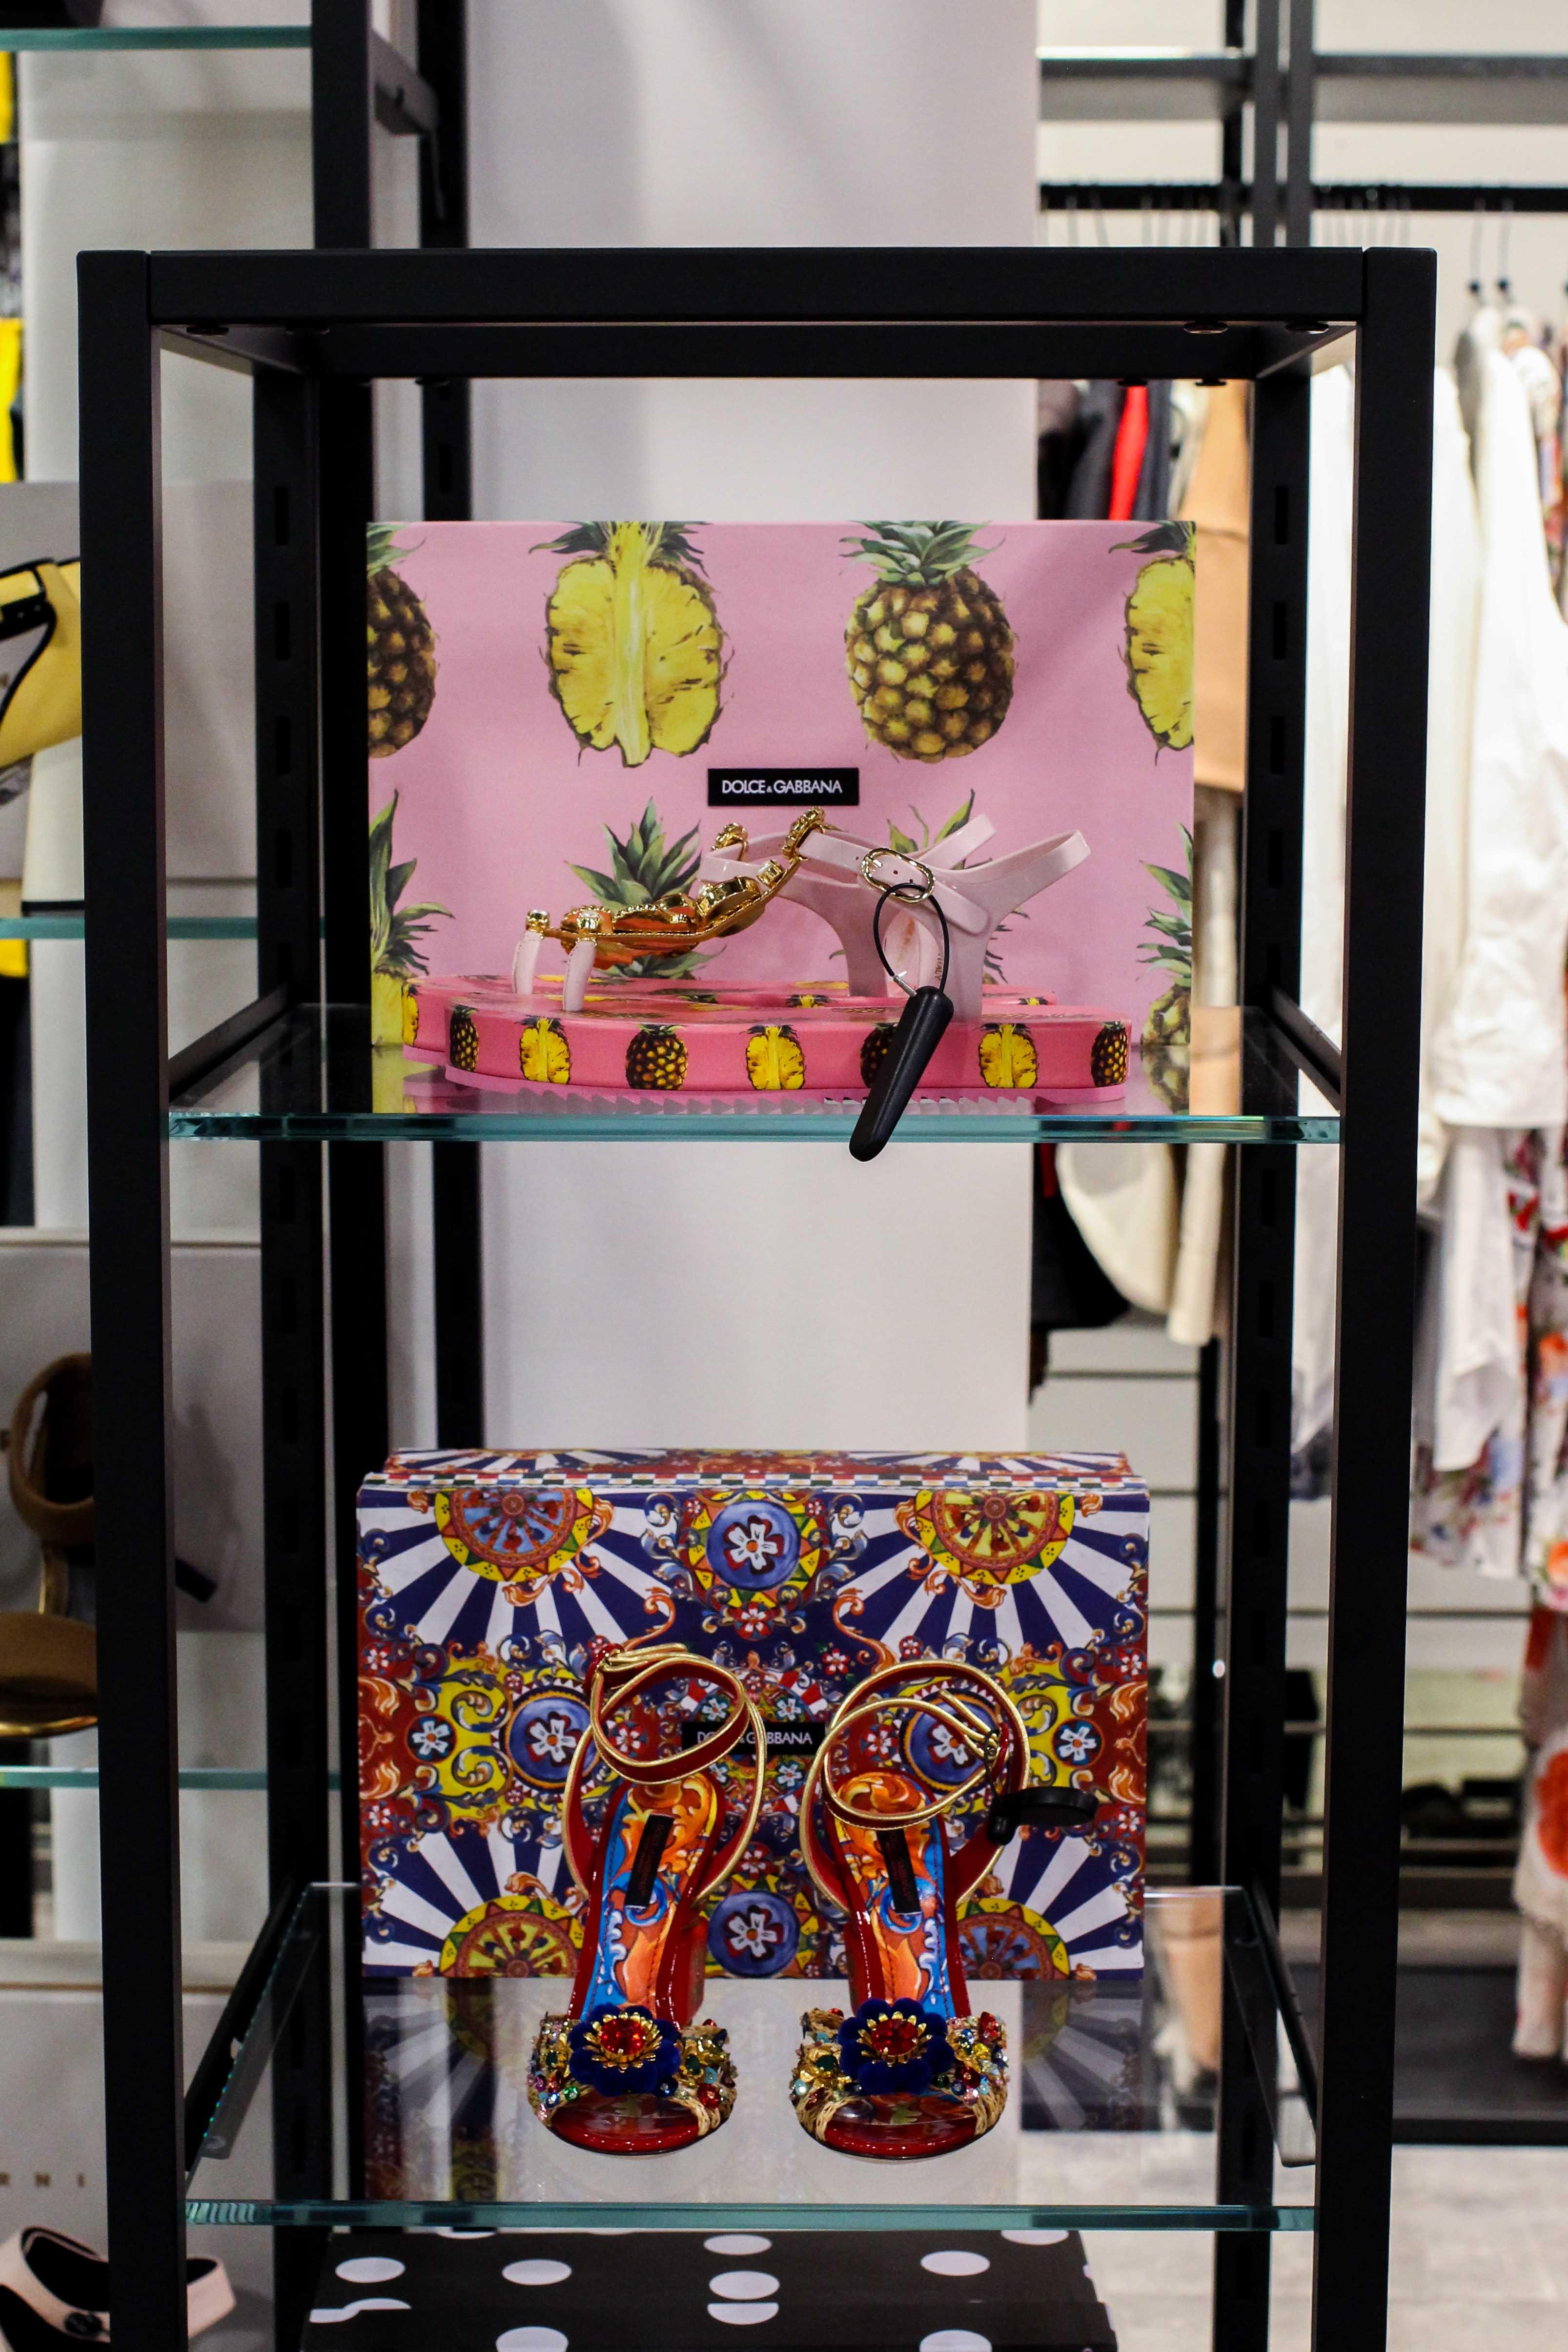 Dolce & Gabanna Heels Store Opening Saks OFF 5th Avenue Bonn Premium-Marken Outletpreis Designer Outlet Bonn Modeblog